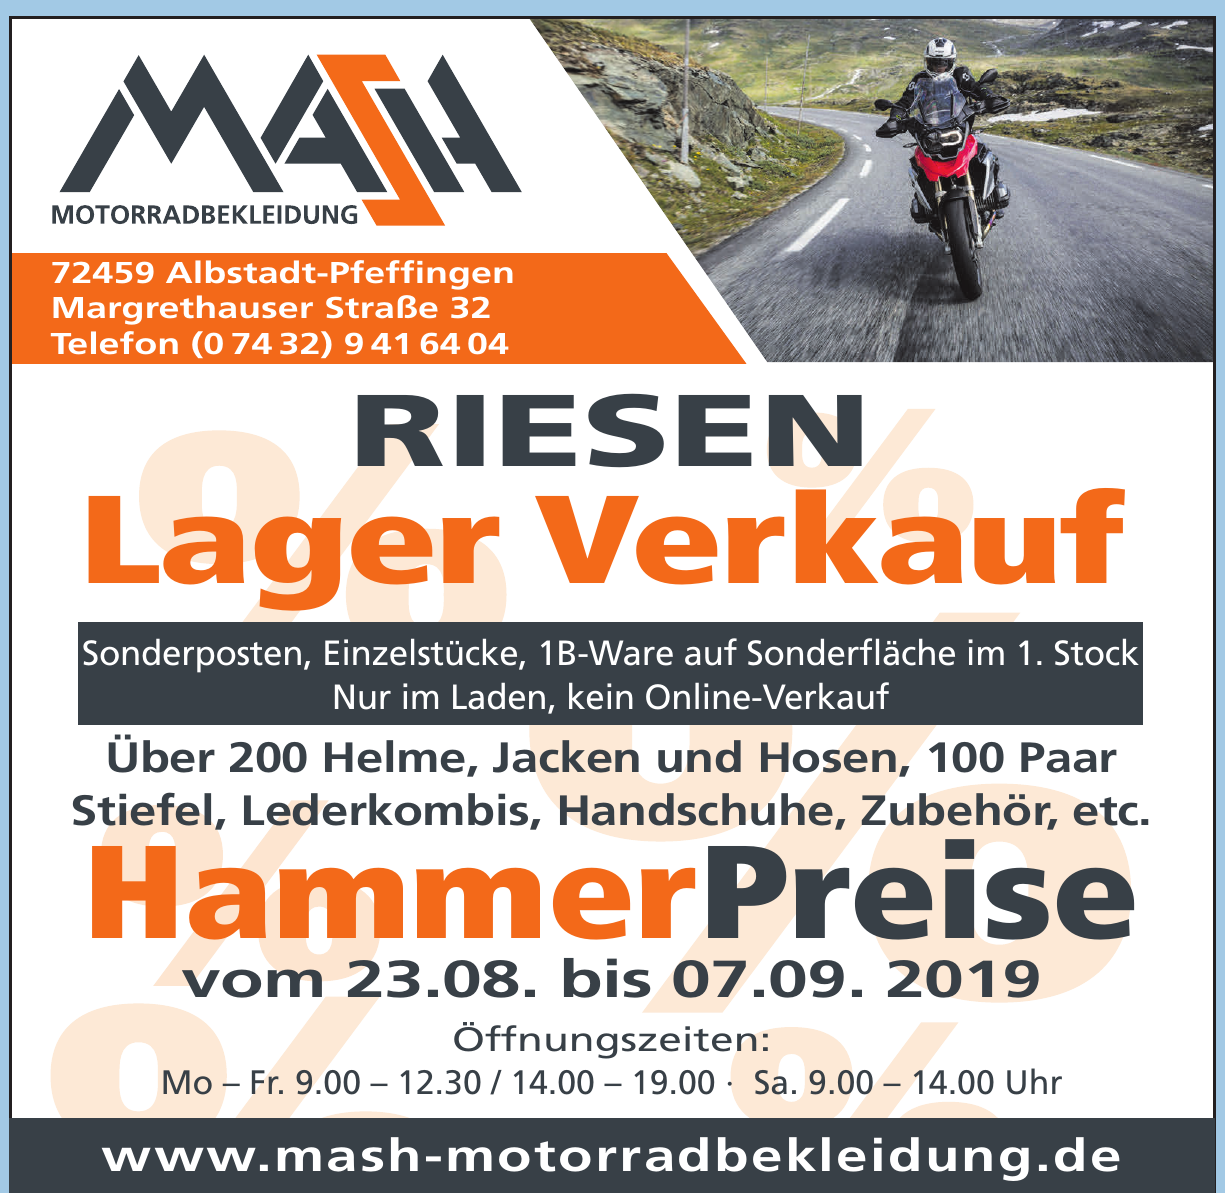 MASH-Motorradbekleidung